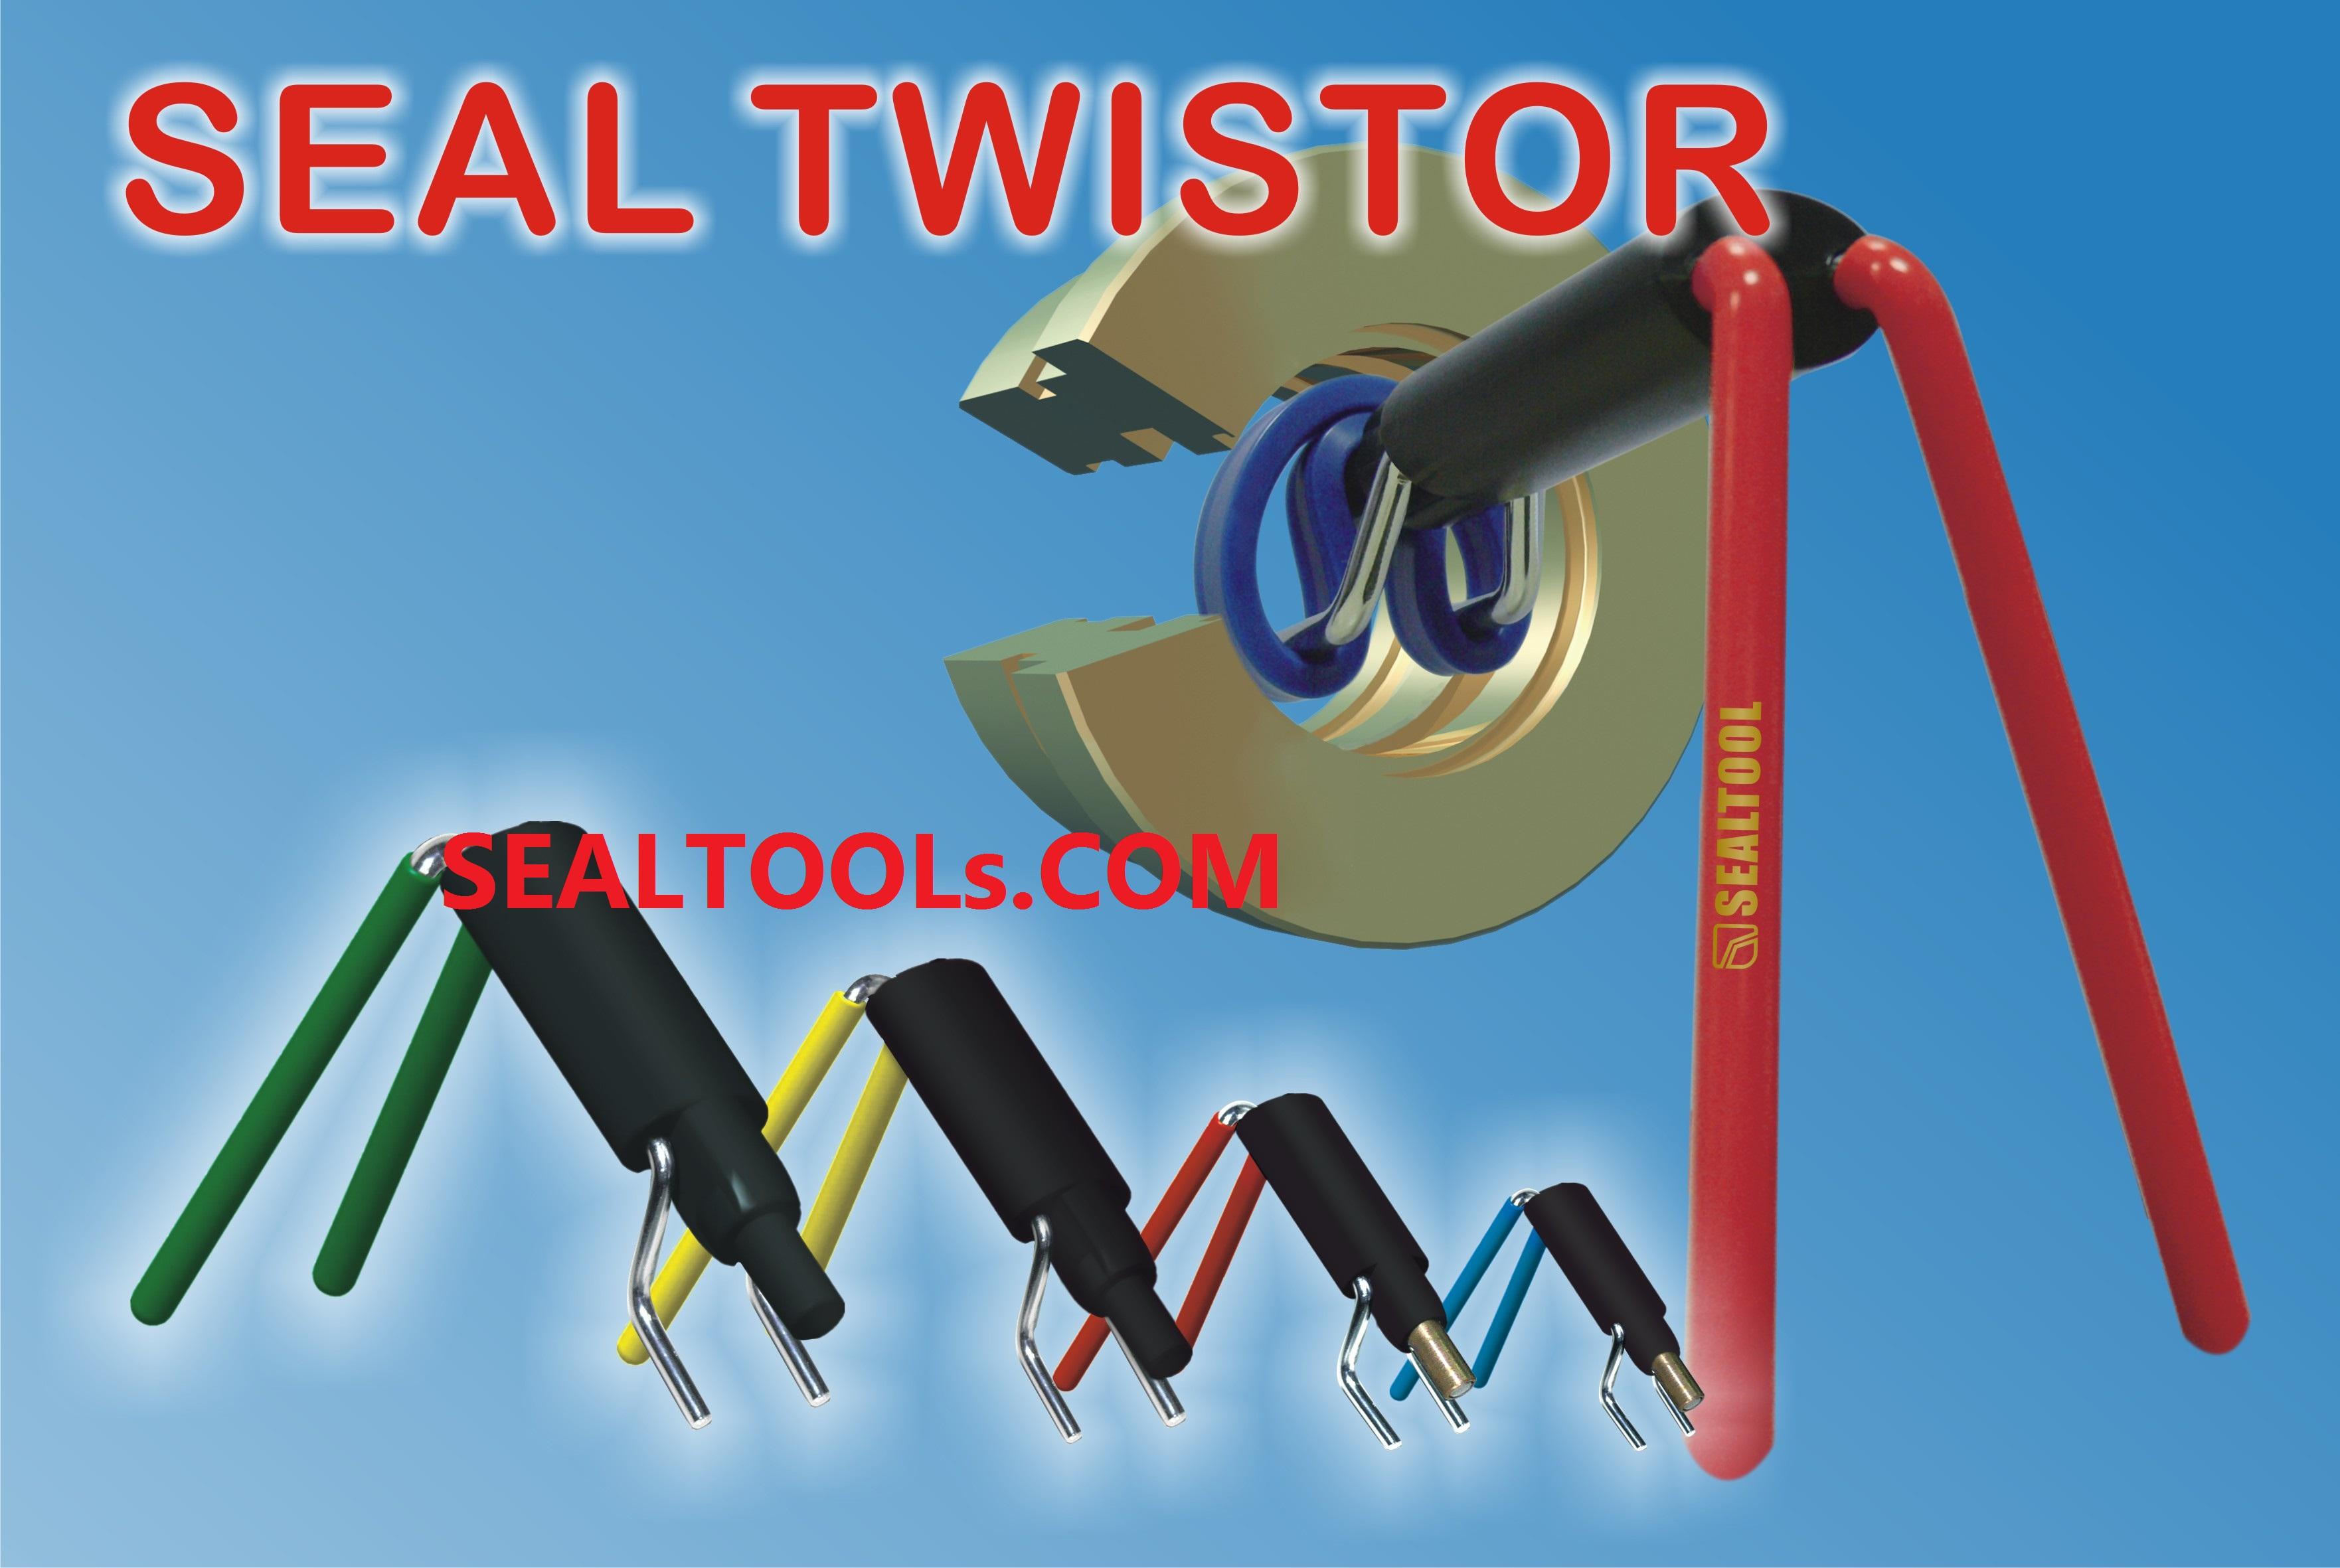 Seal Twistor - Dụng cụ lắp phốt